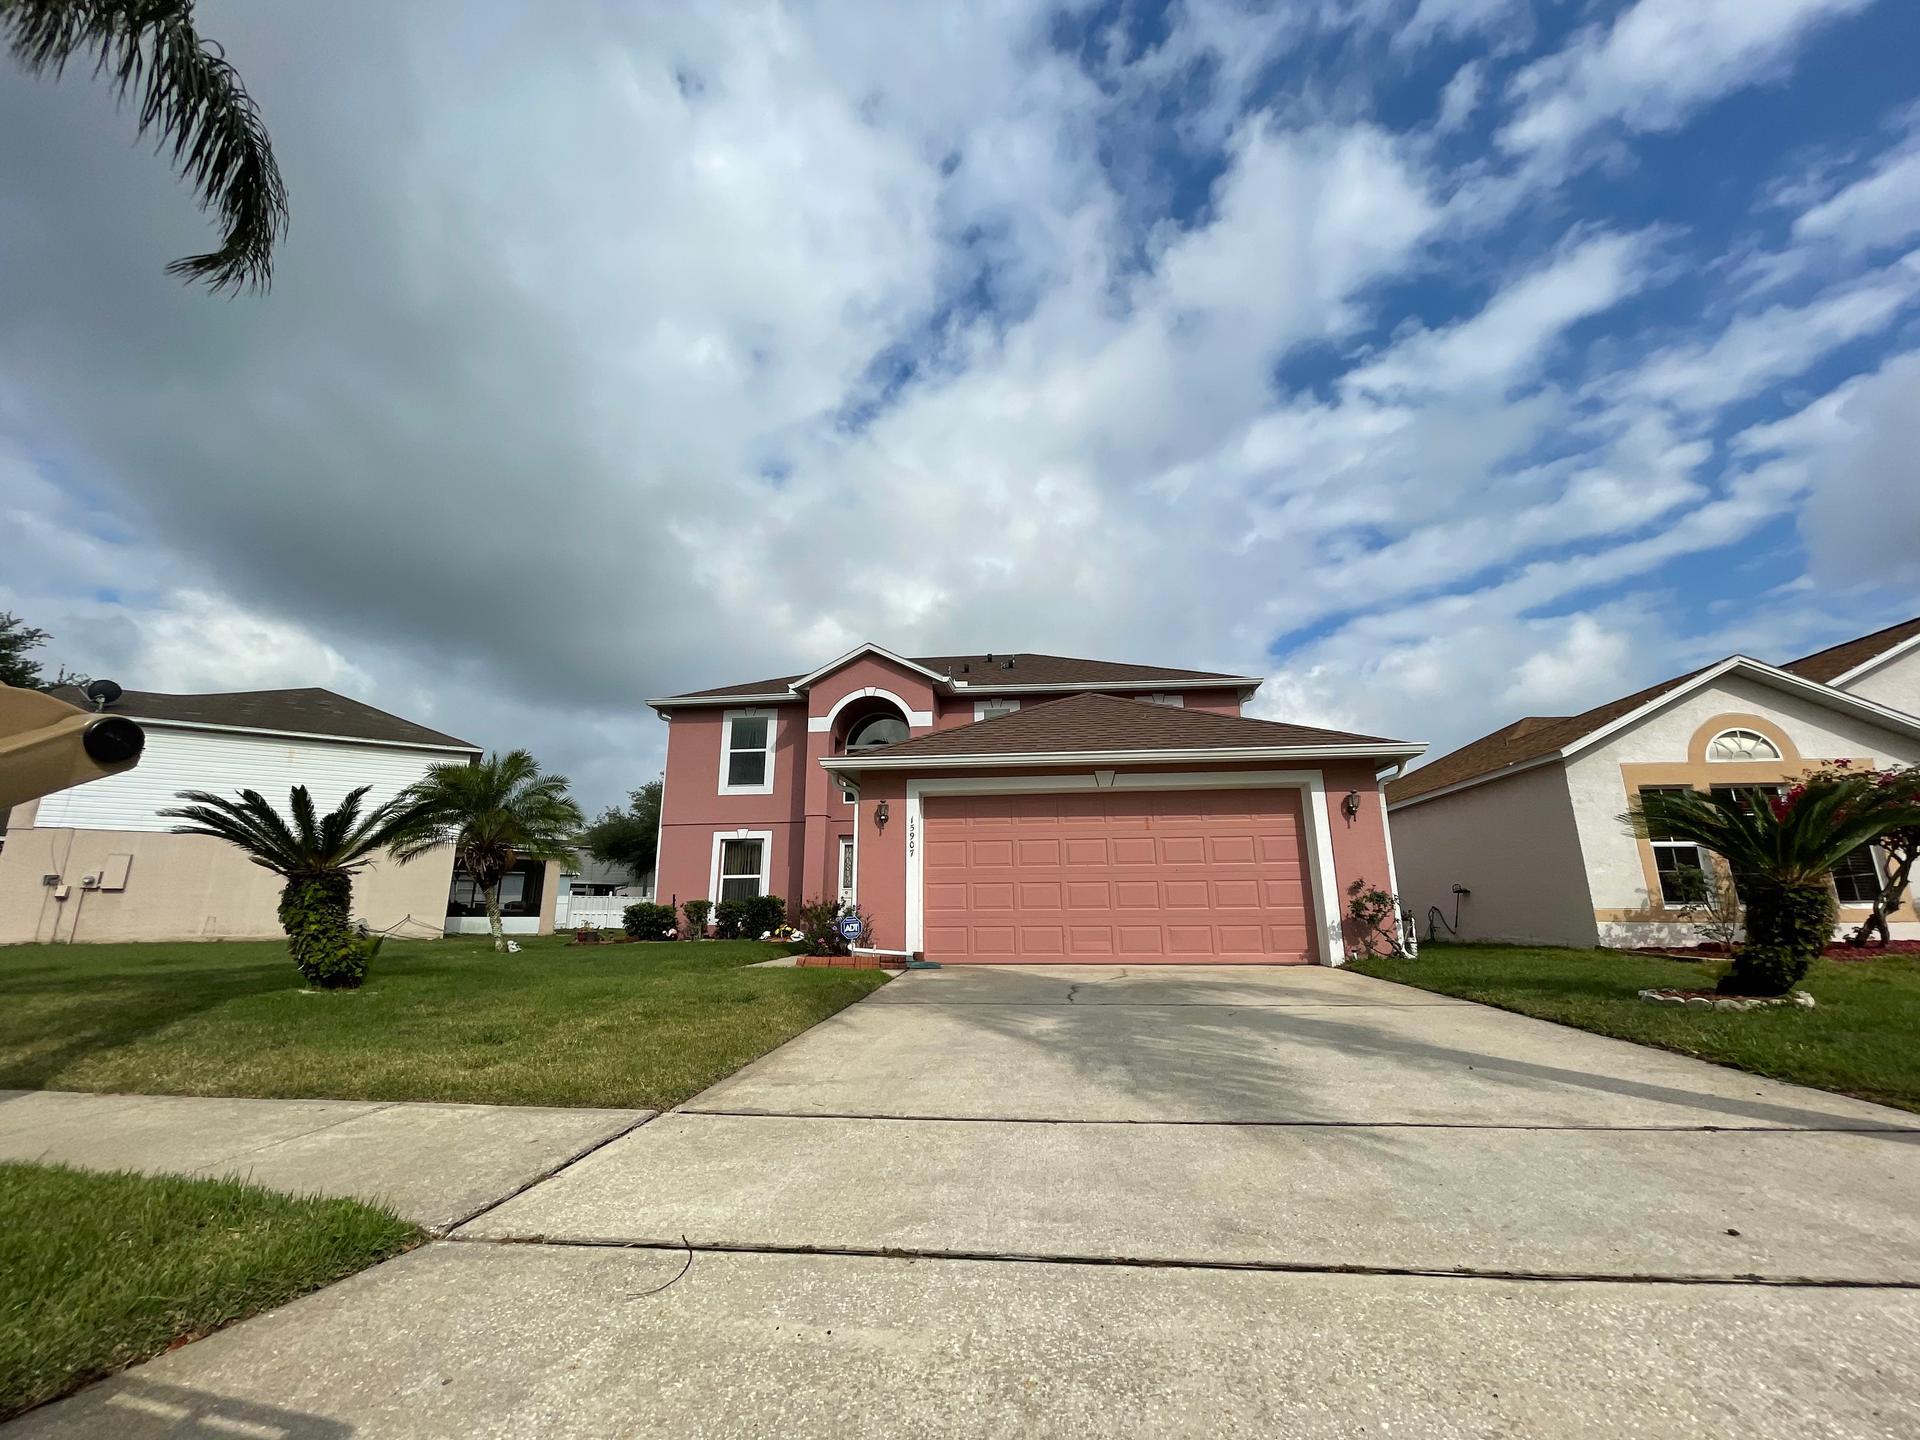 Photo of property: 15907 Wilkinson Drive, FL 34714